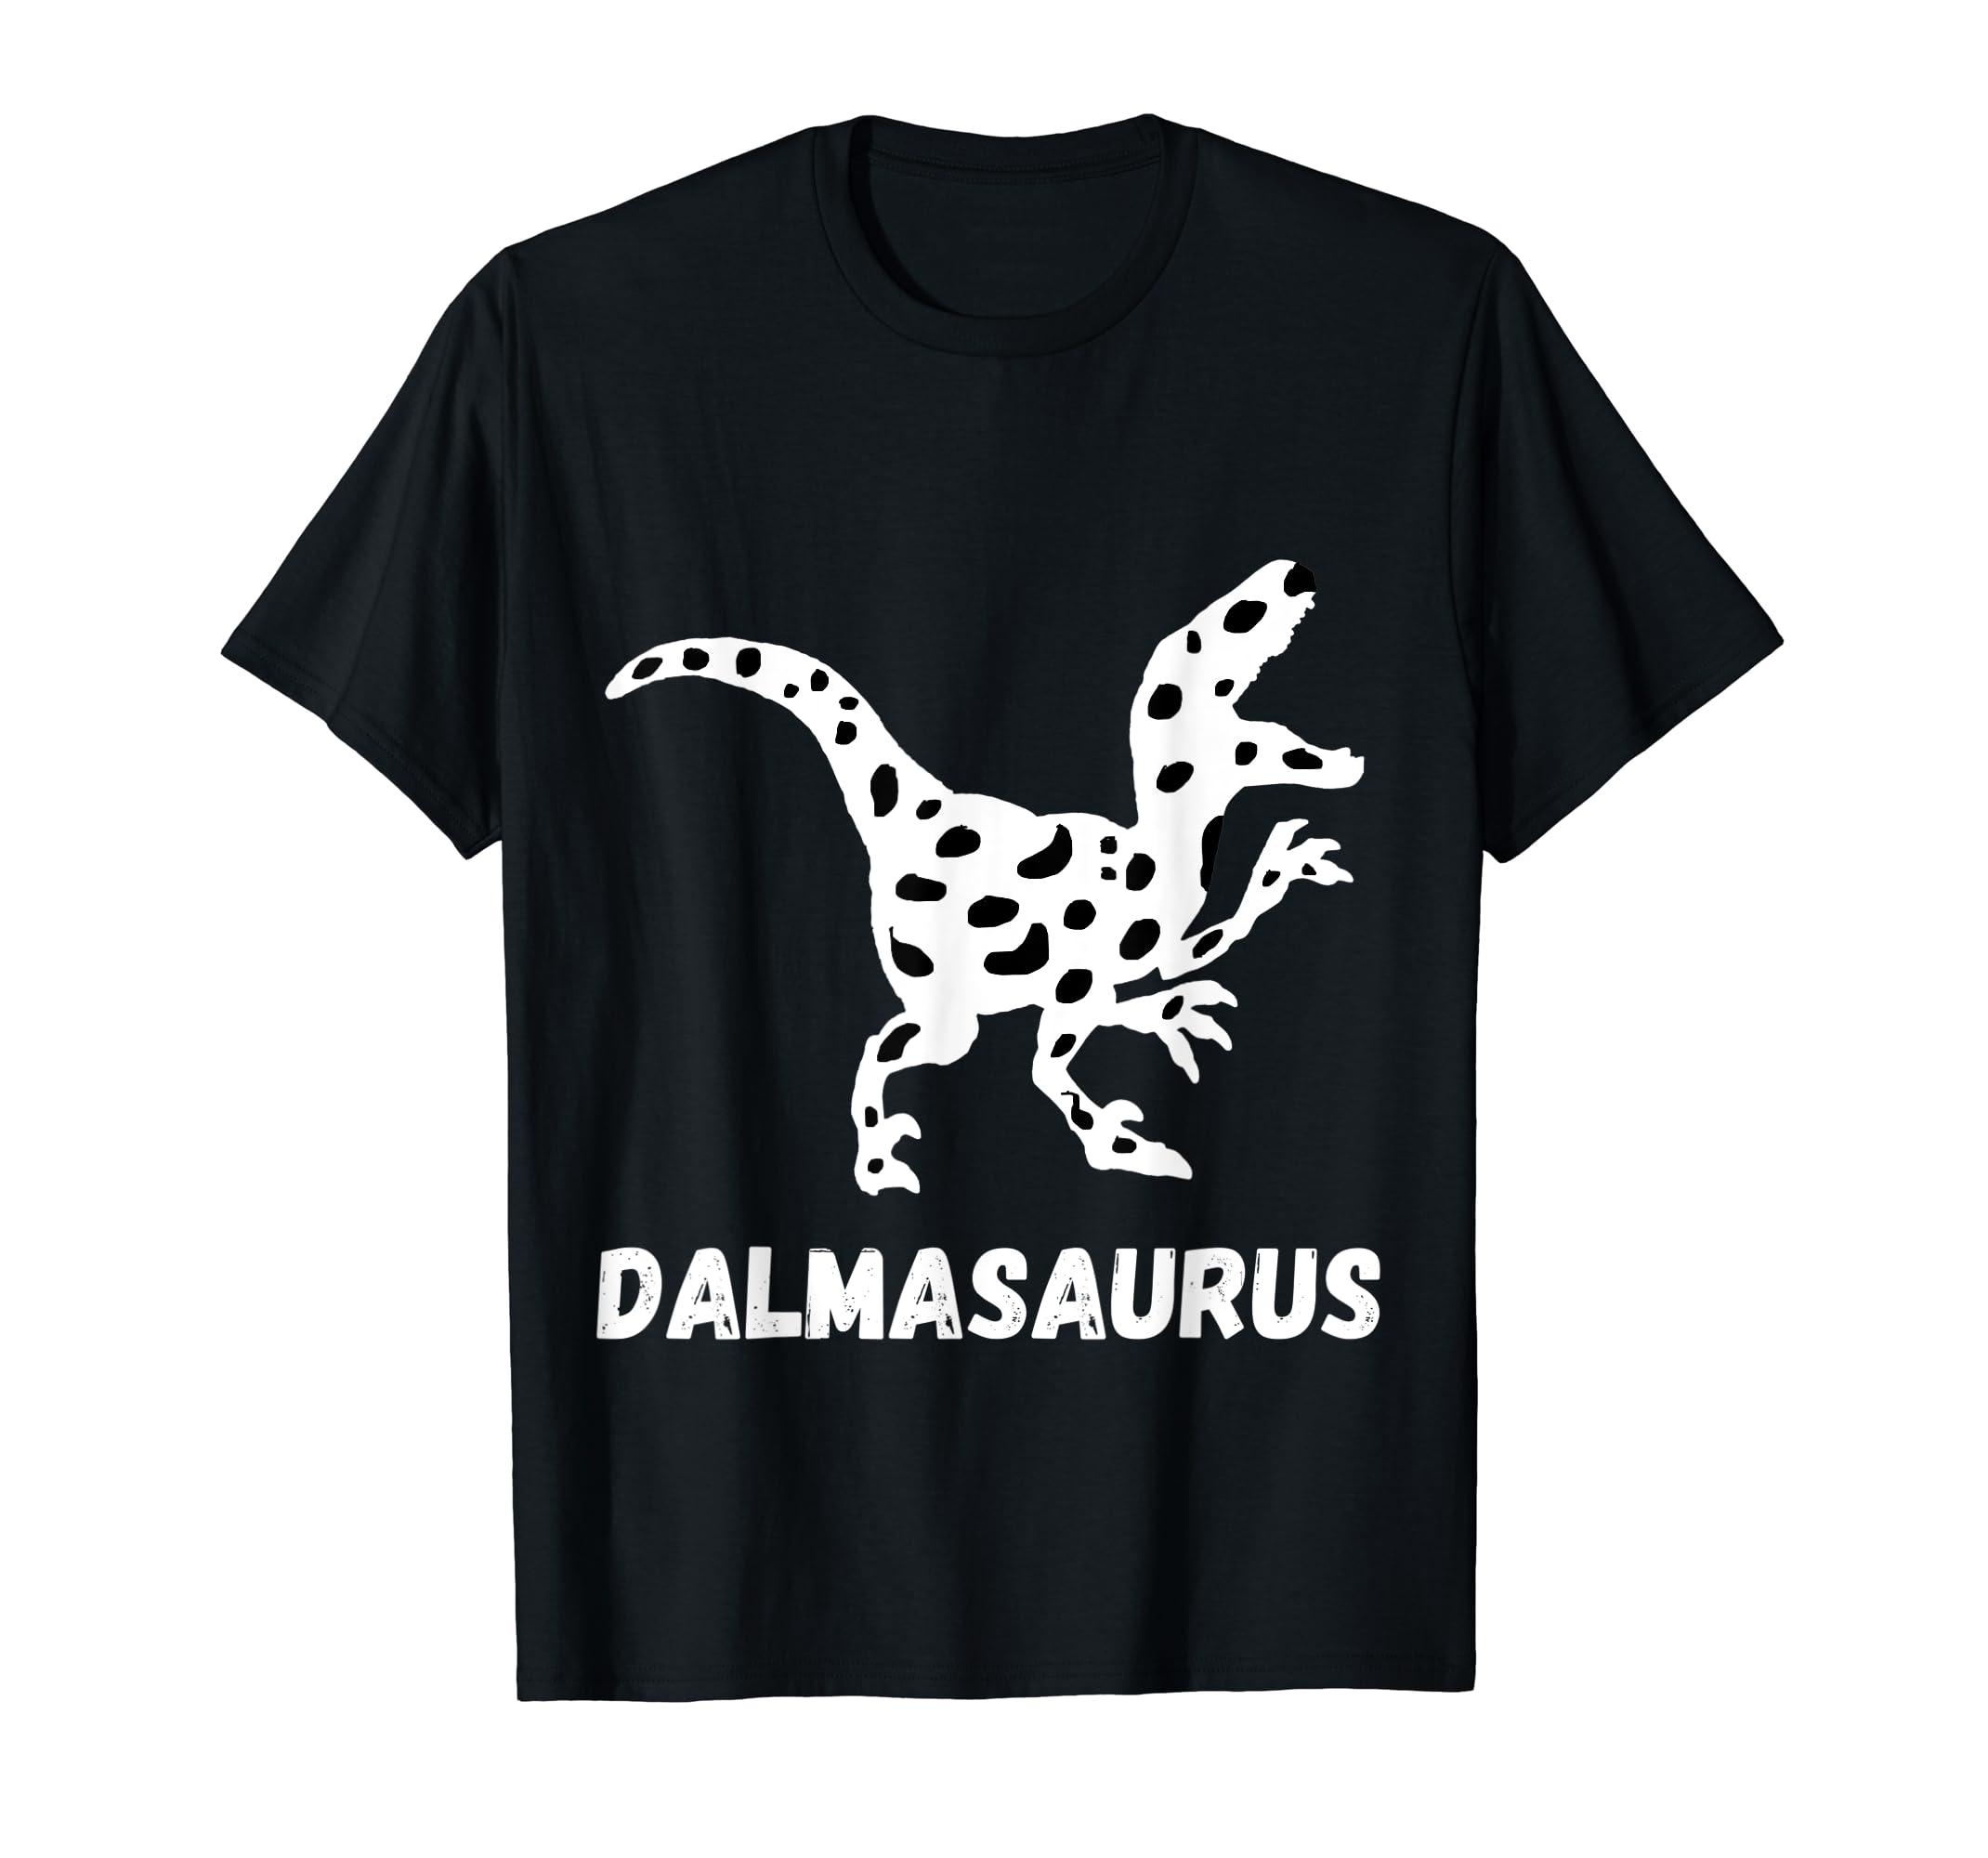 Dalmatian Saurus Dalmatians Dog Dinosaurs Puppy Breed TShirt-Men's T-Shirt-Black